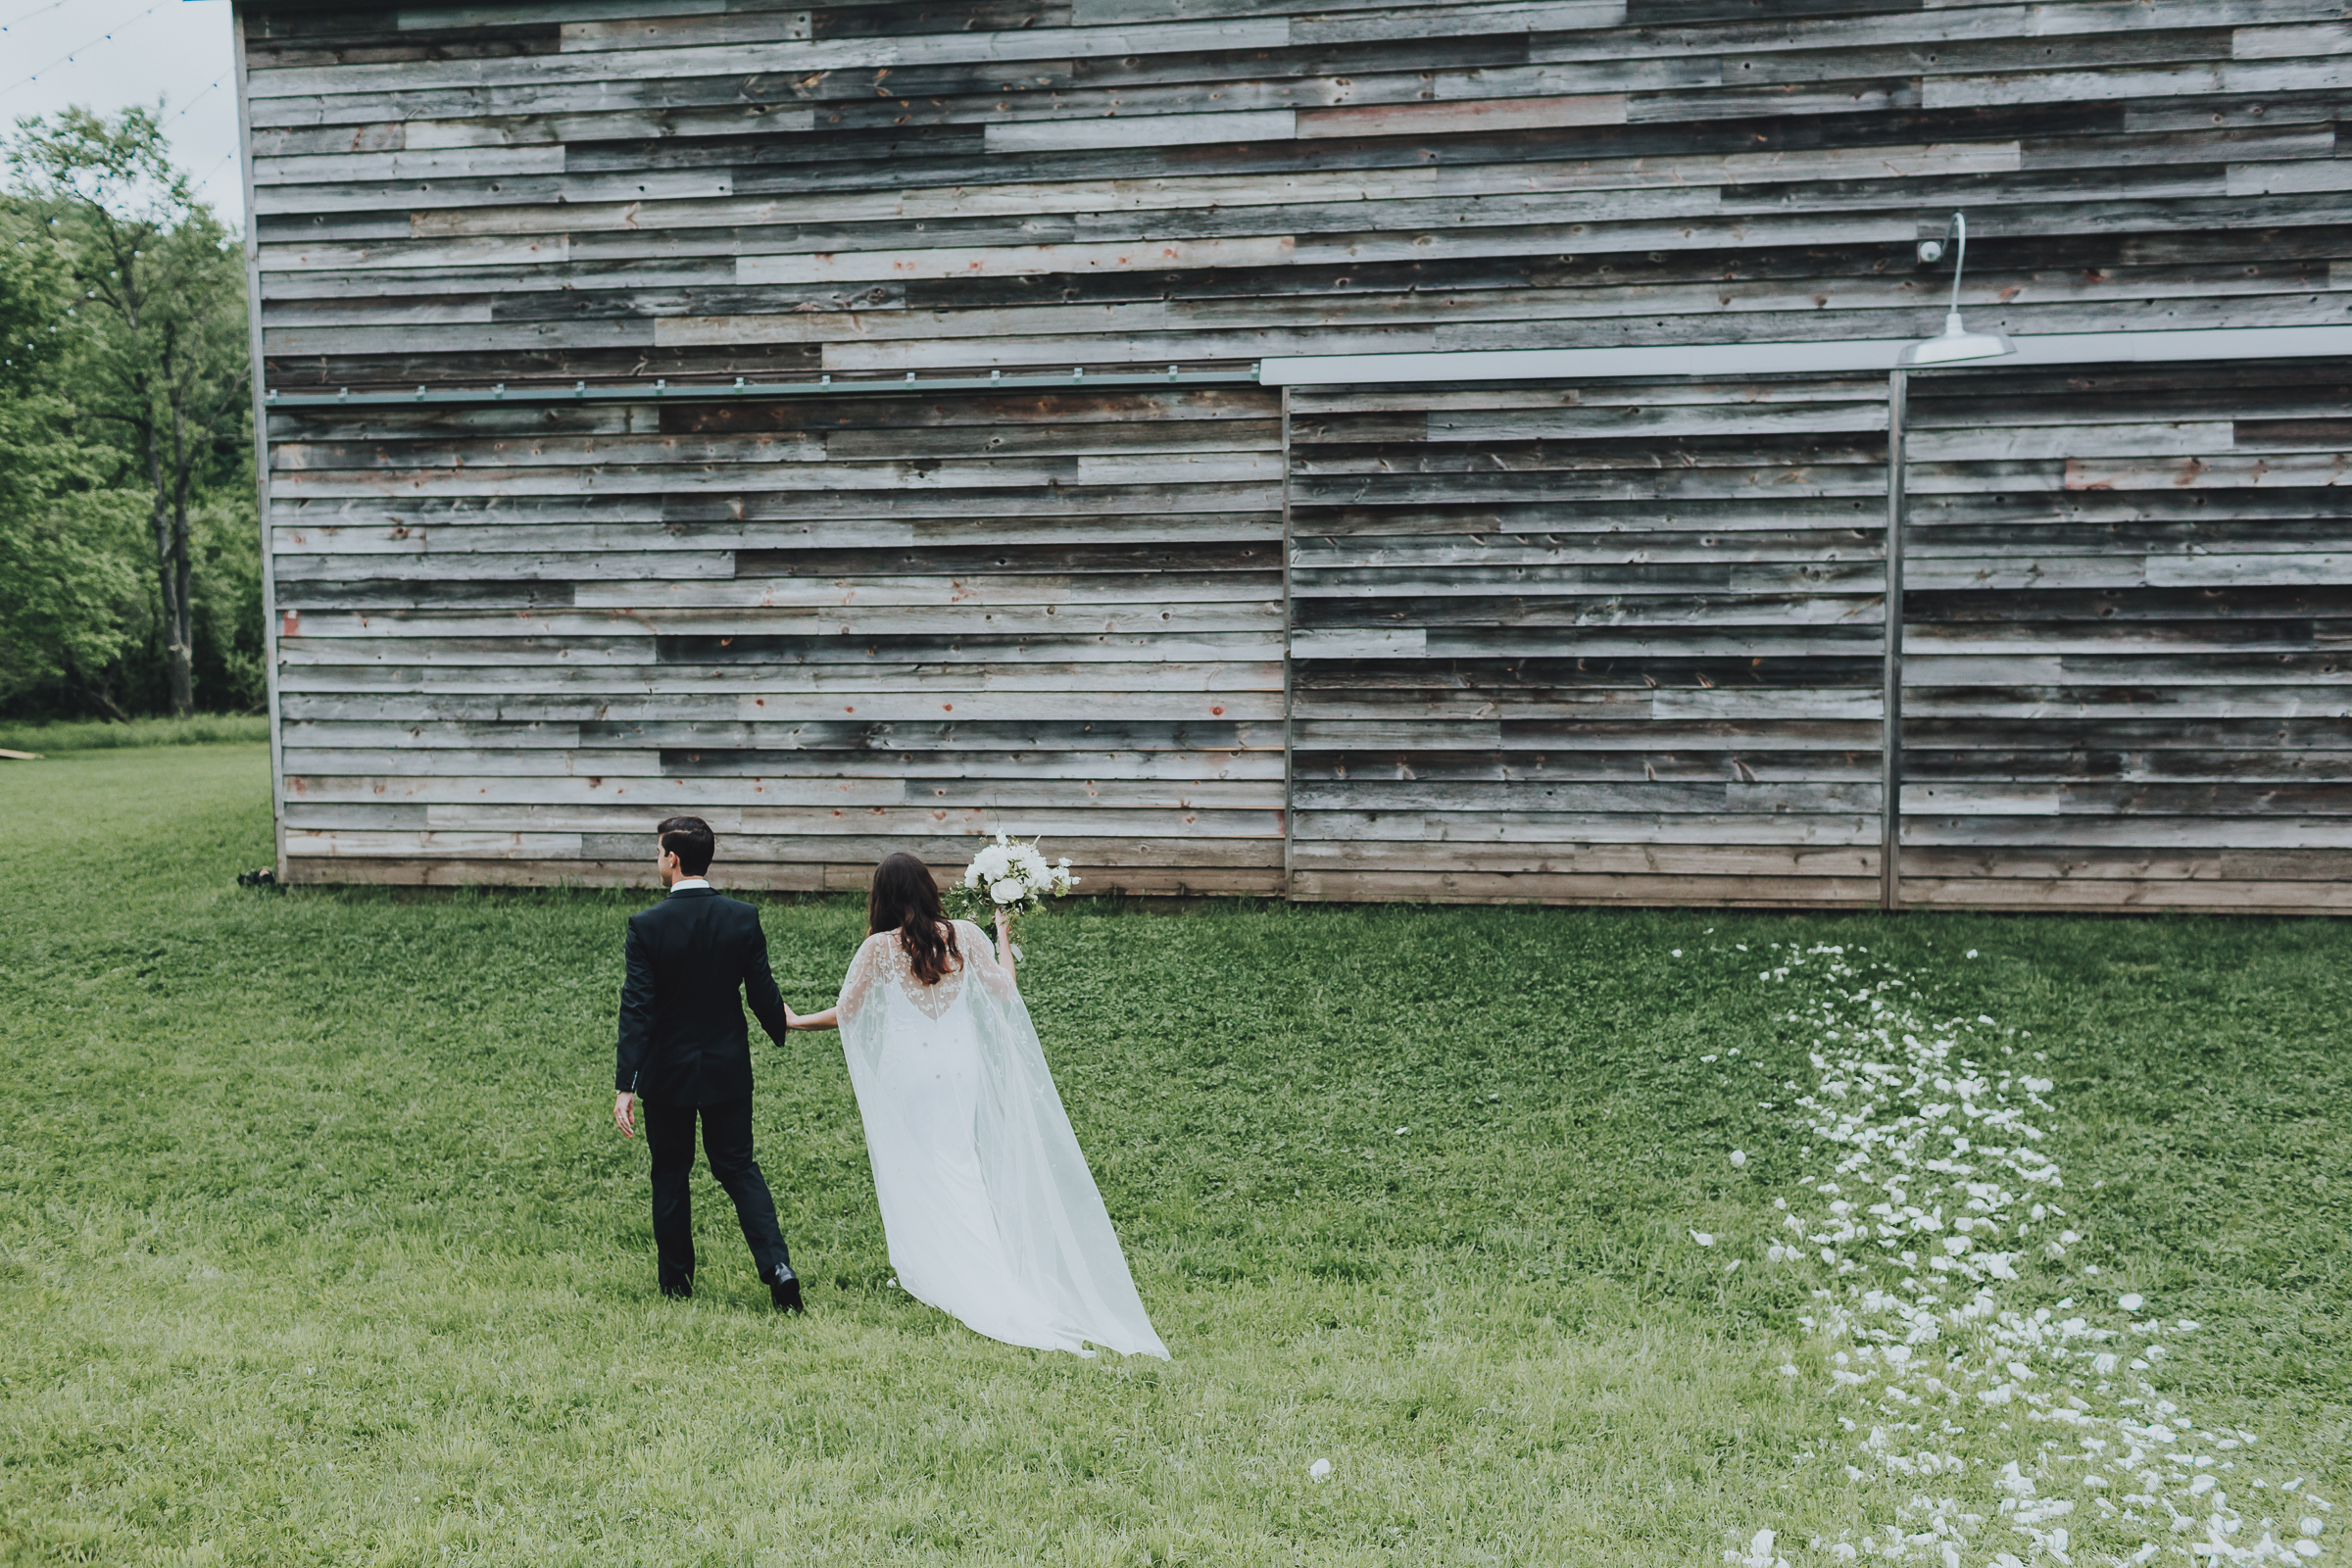 Handsome-Hollow-Long-Eddy-Catskills-New-York-Fine-Art-Documentary-Wedding-Photographer-75.jpg